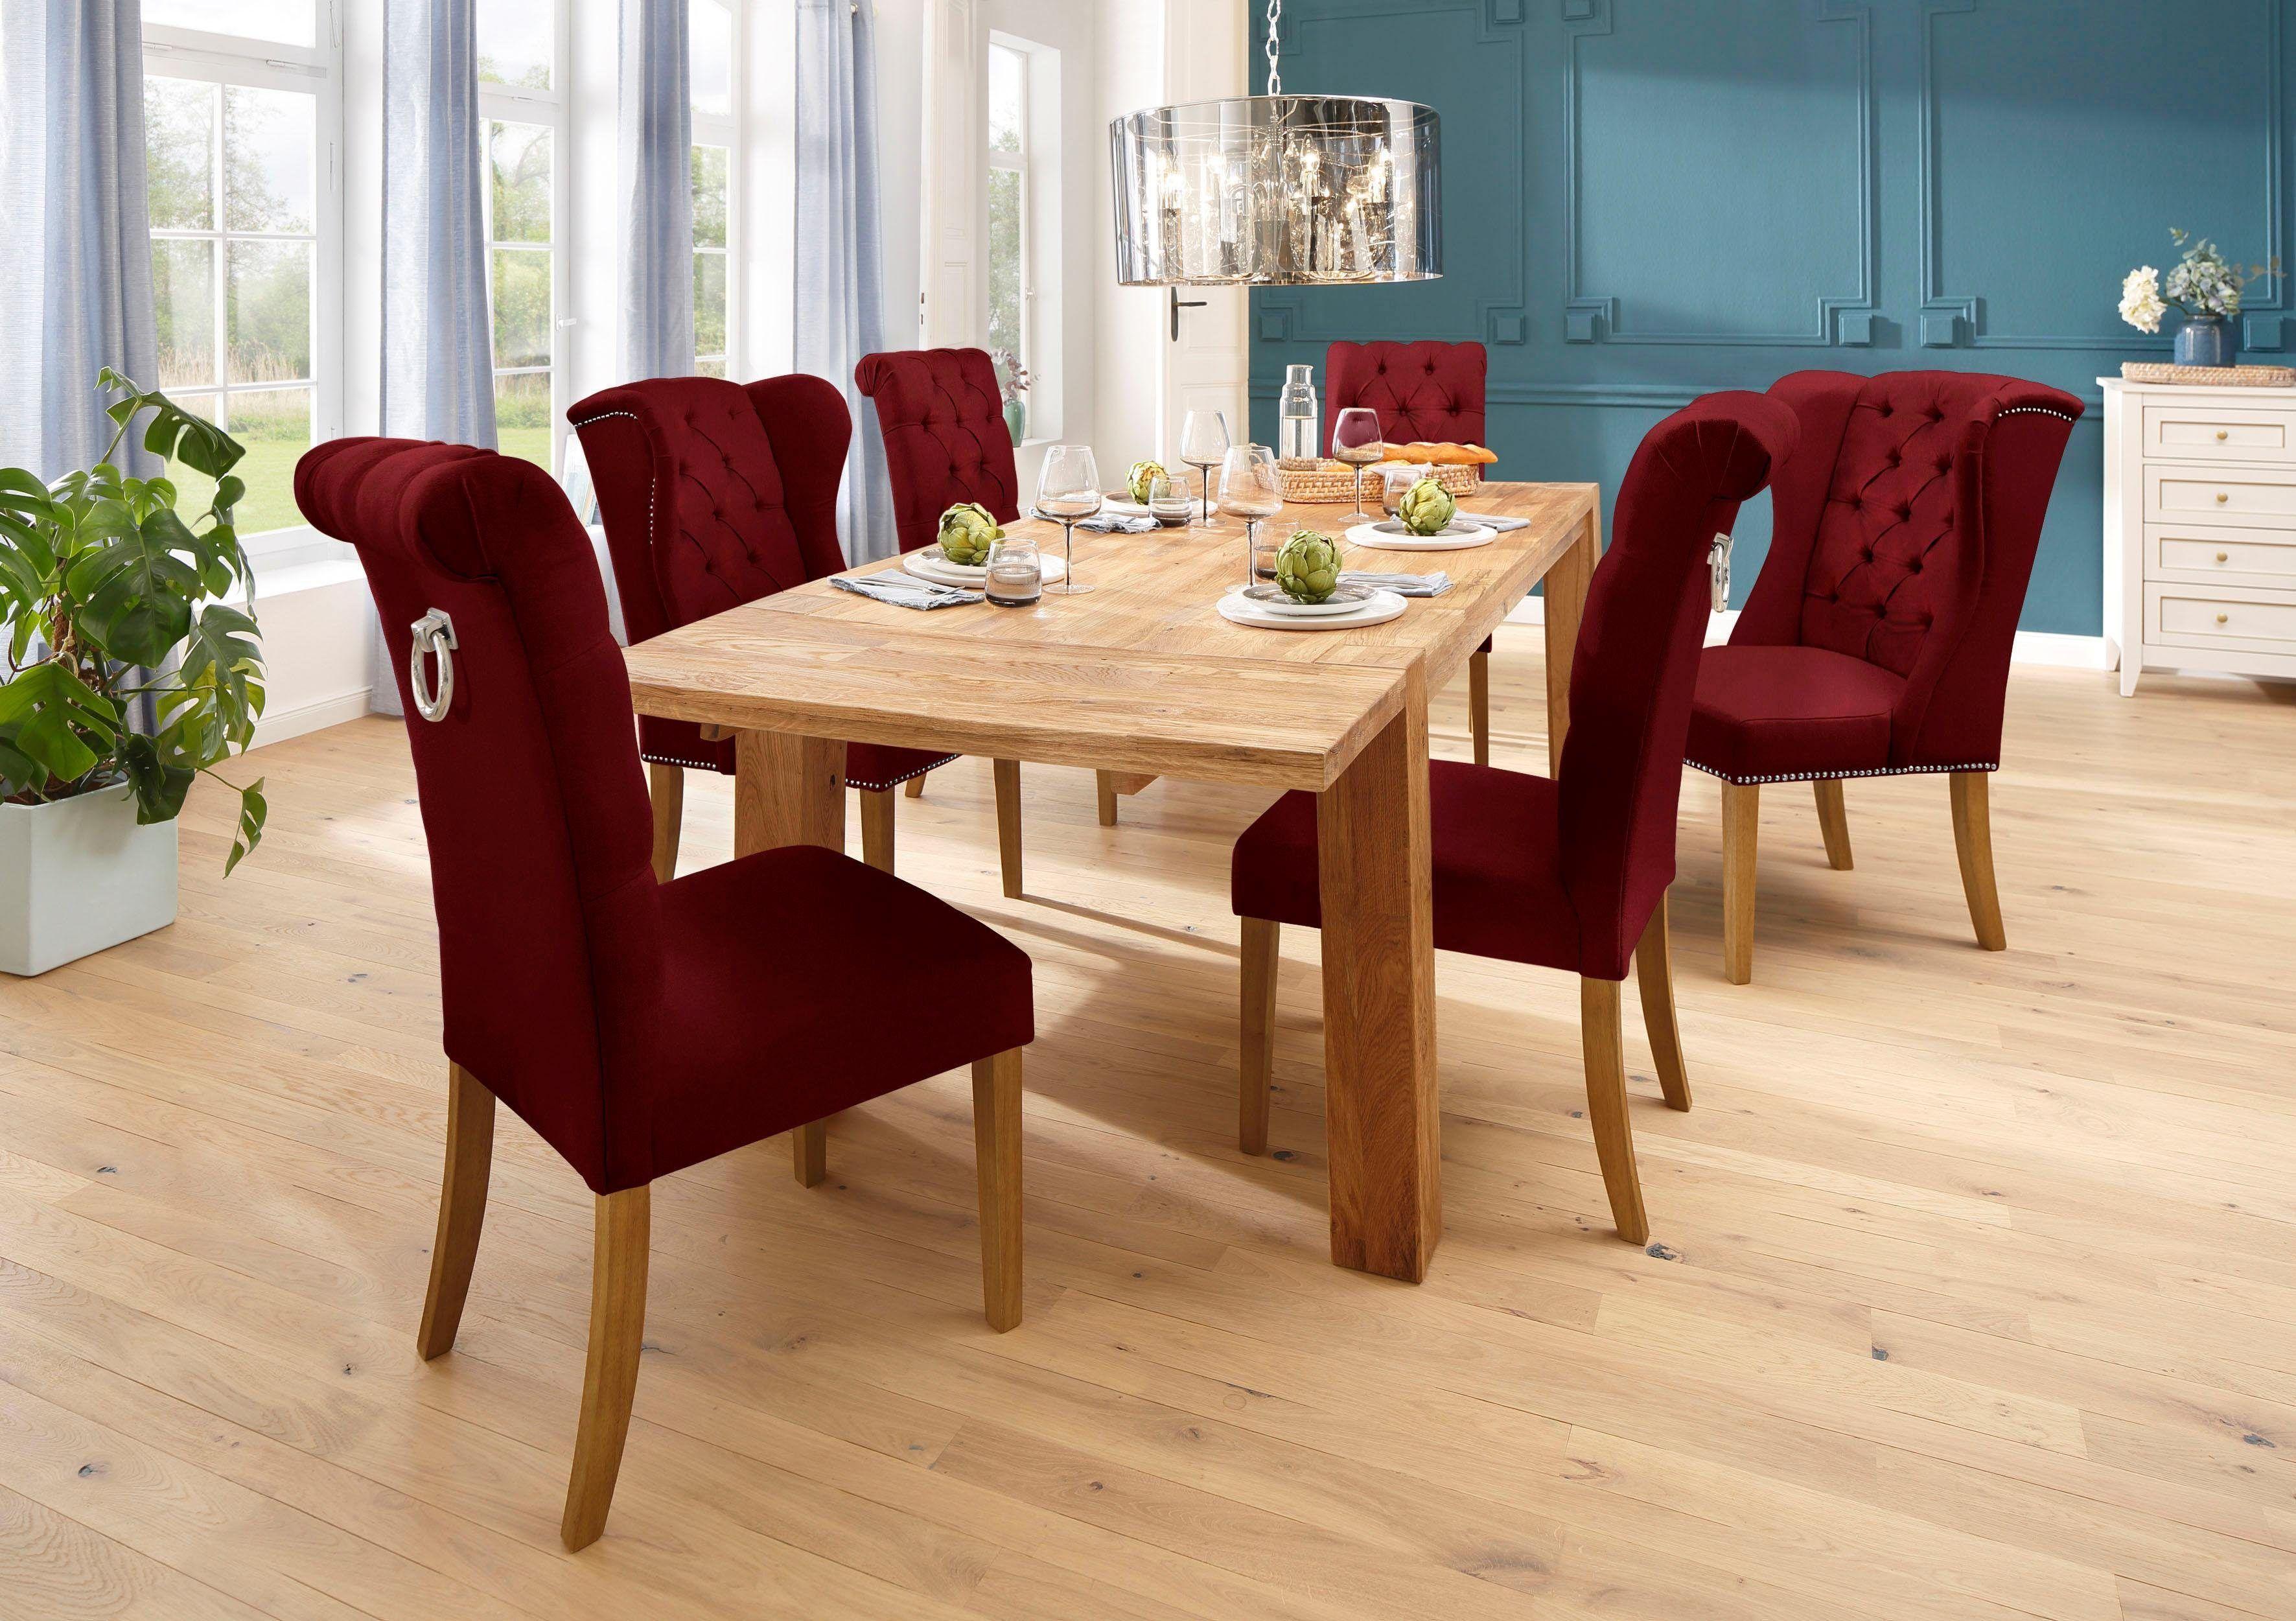 Rote Esszimmer Stuhle Stuhle Decordiyhome Com Home Dining